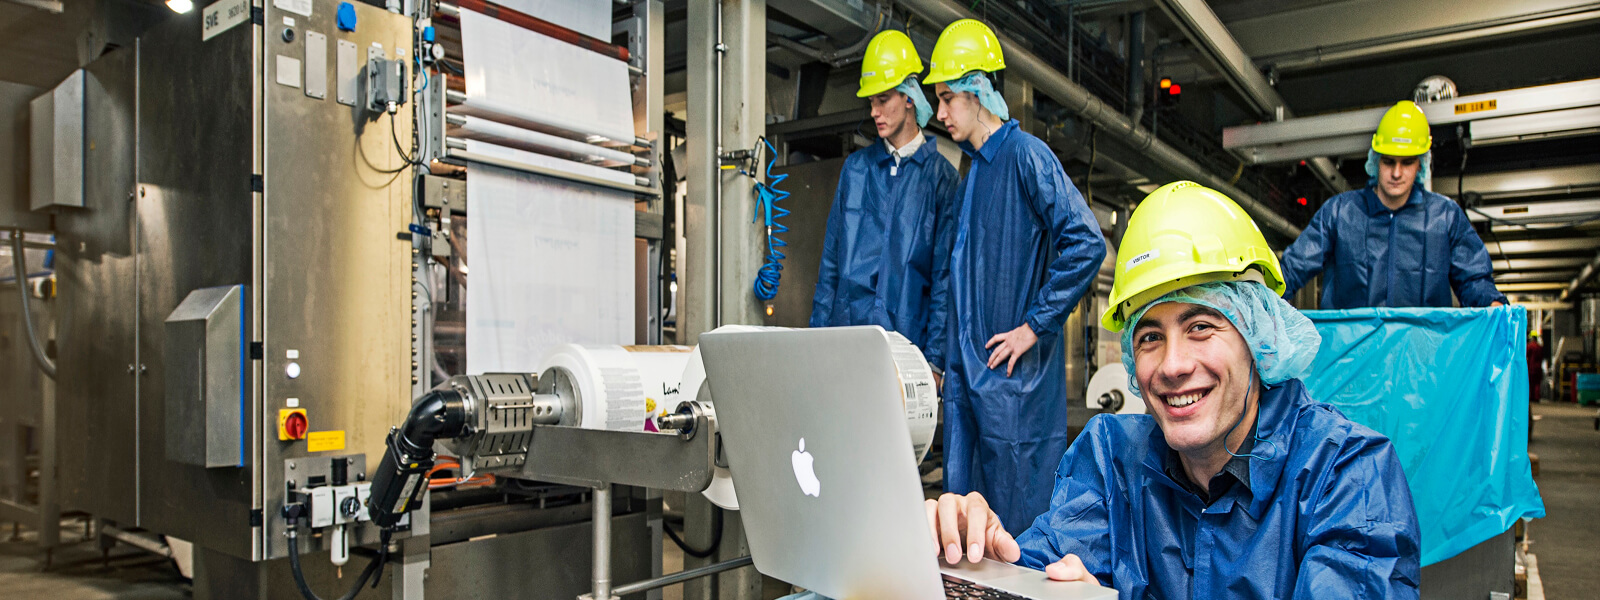 bachelor-industrial-engineering-and-management-studyinholland-universitiesofappliedsciences-hz-zeeland-middelburg-holland